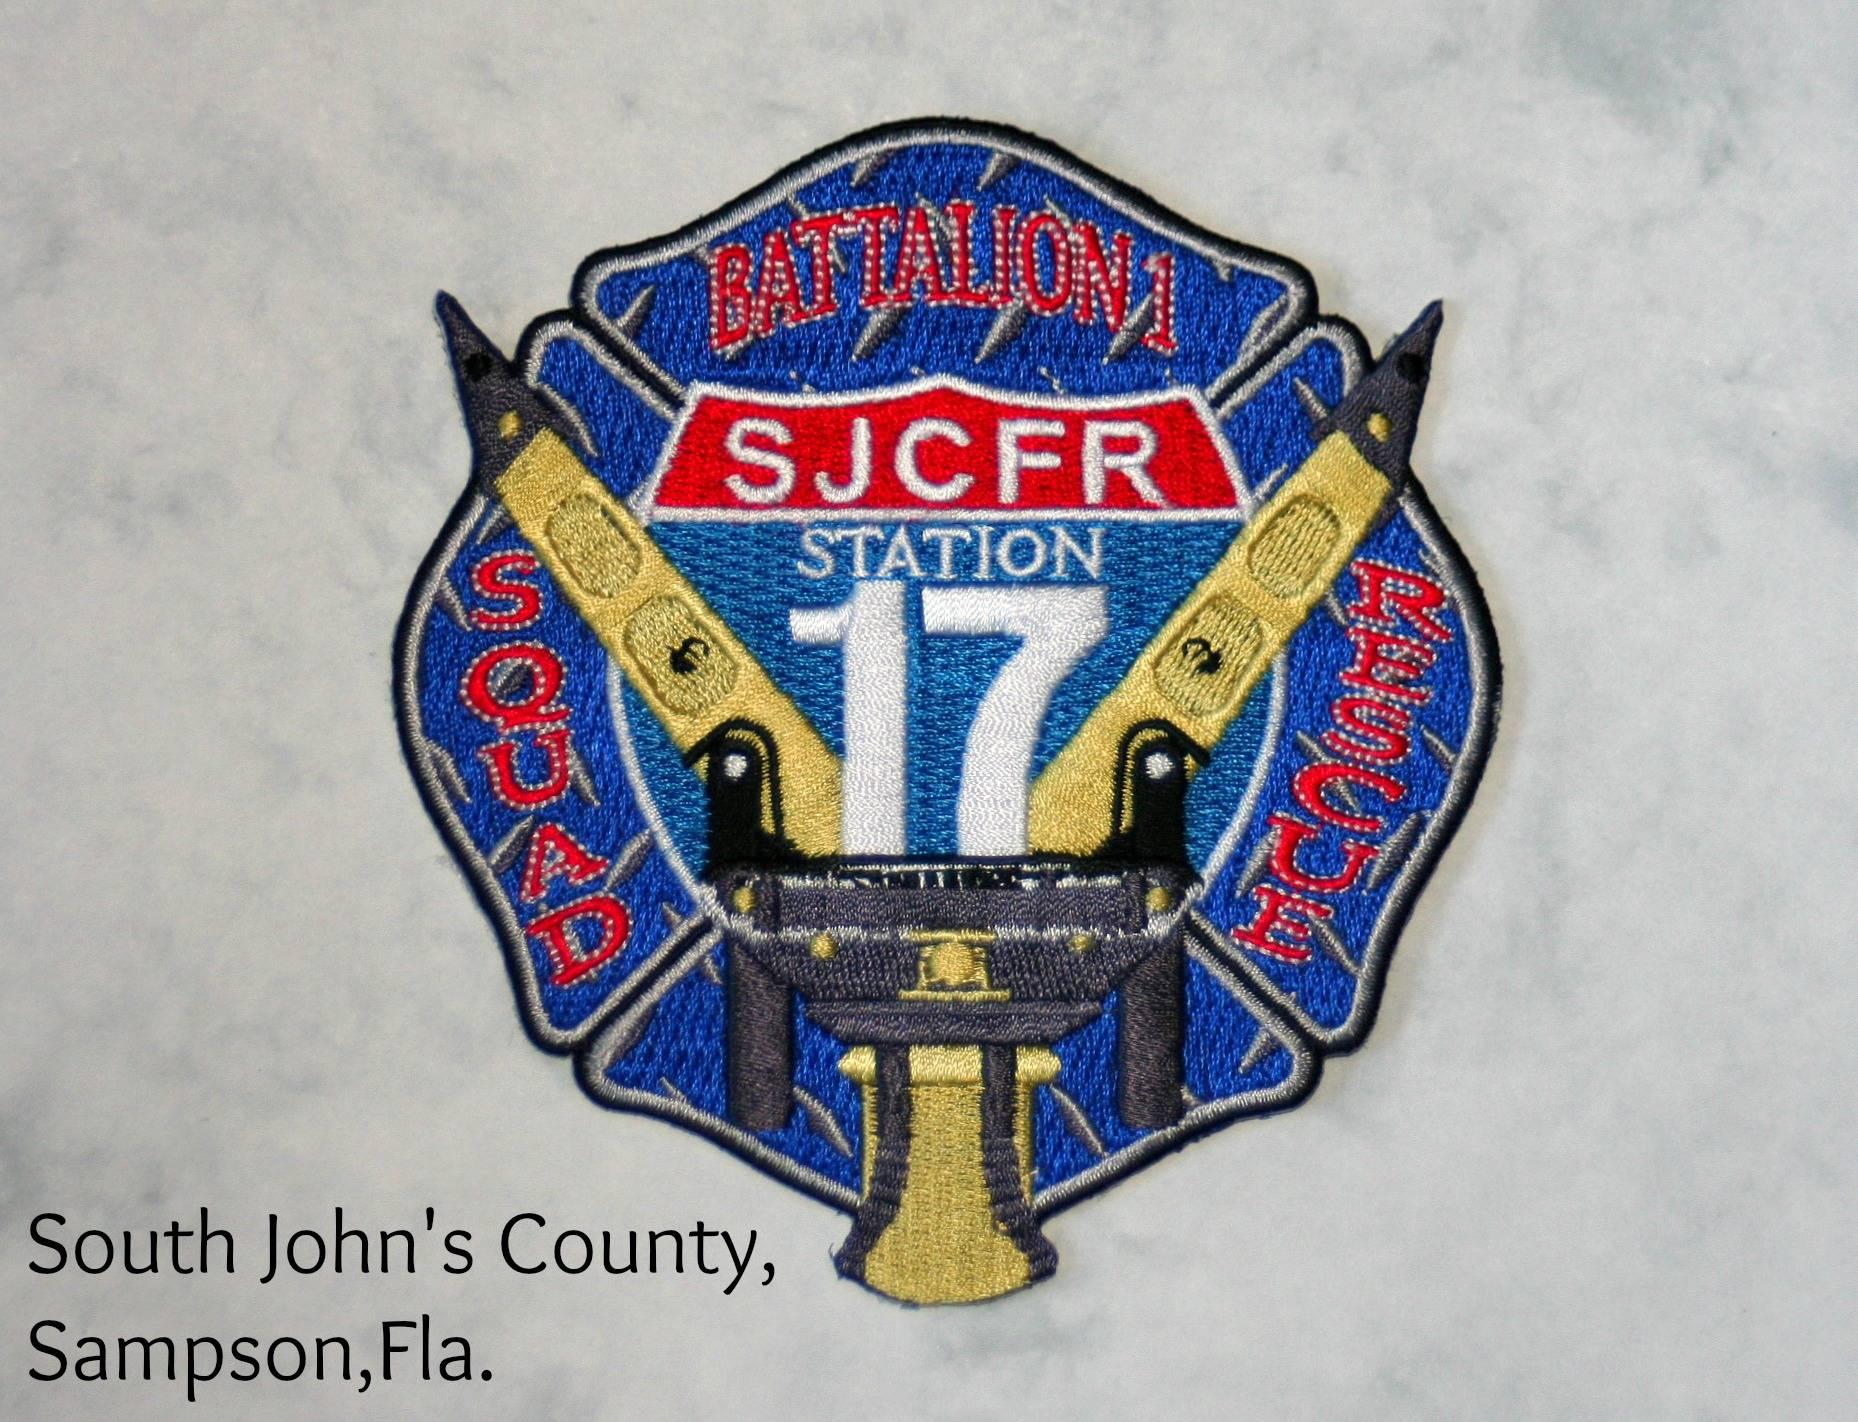 South John's County, Sampons, Fla.